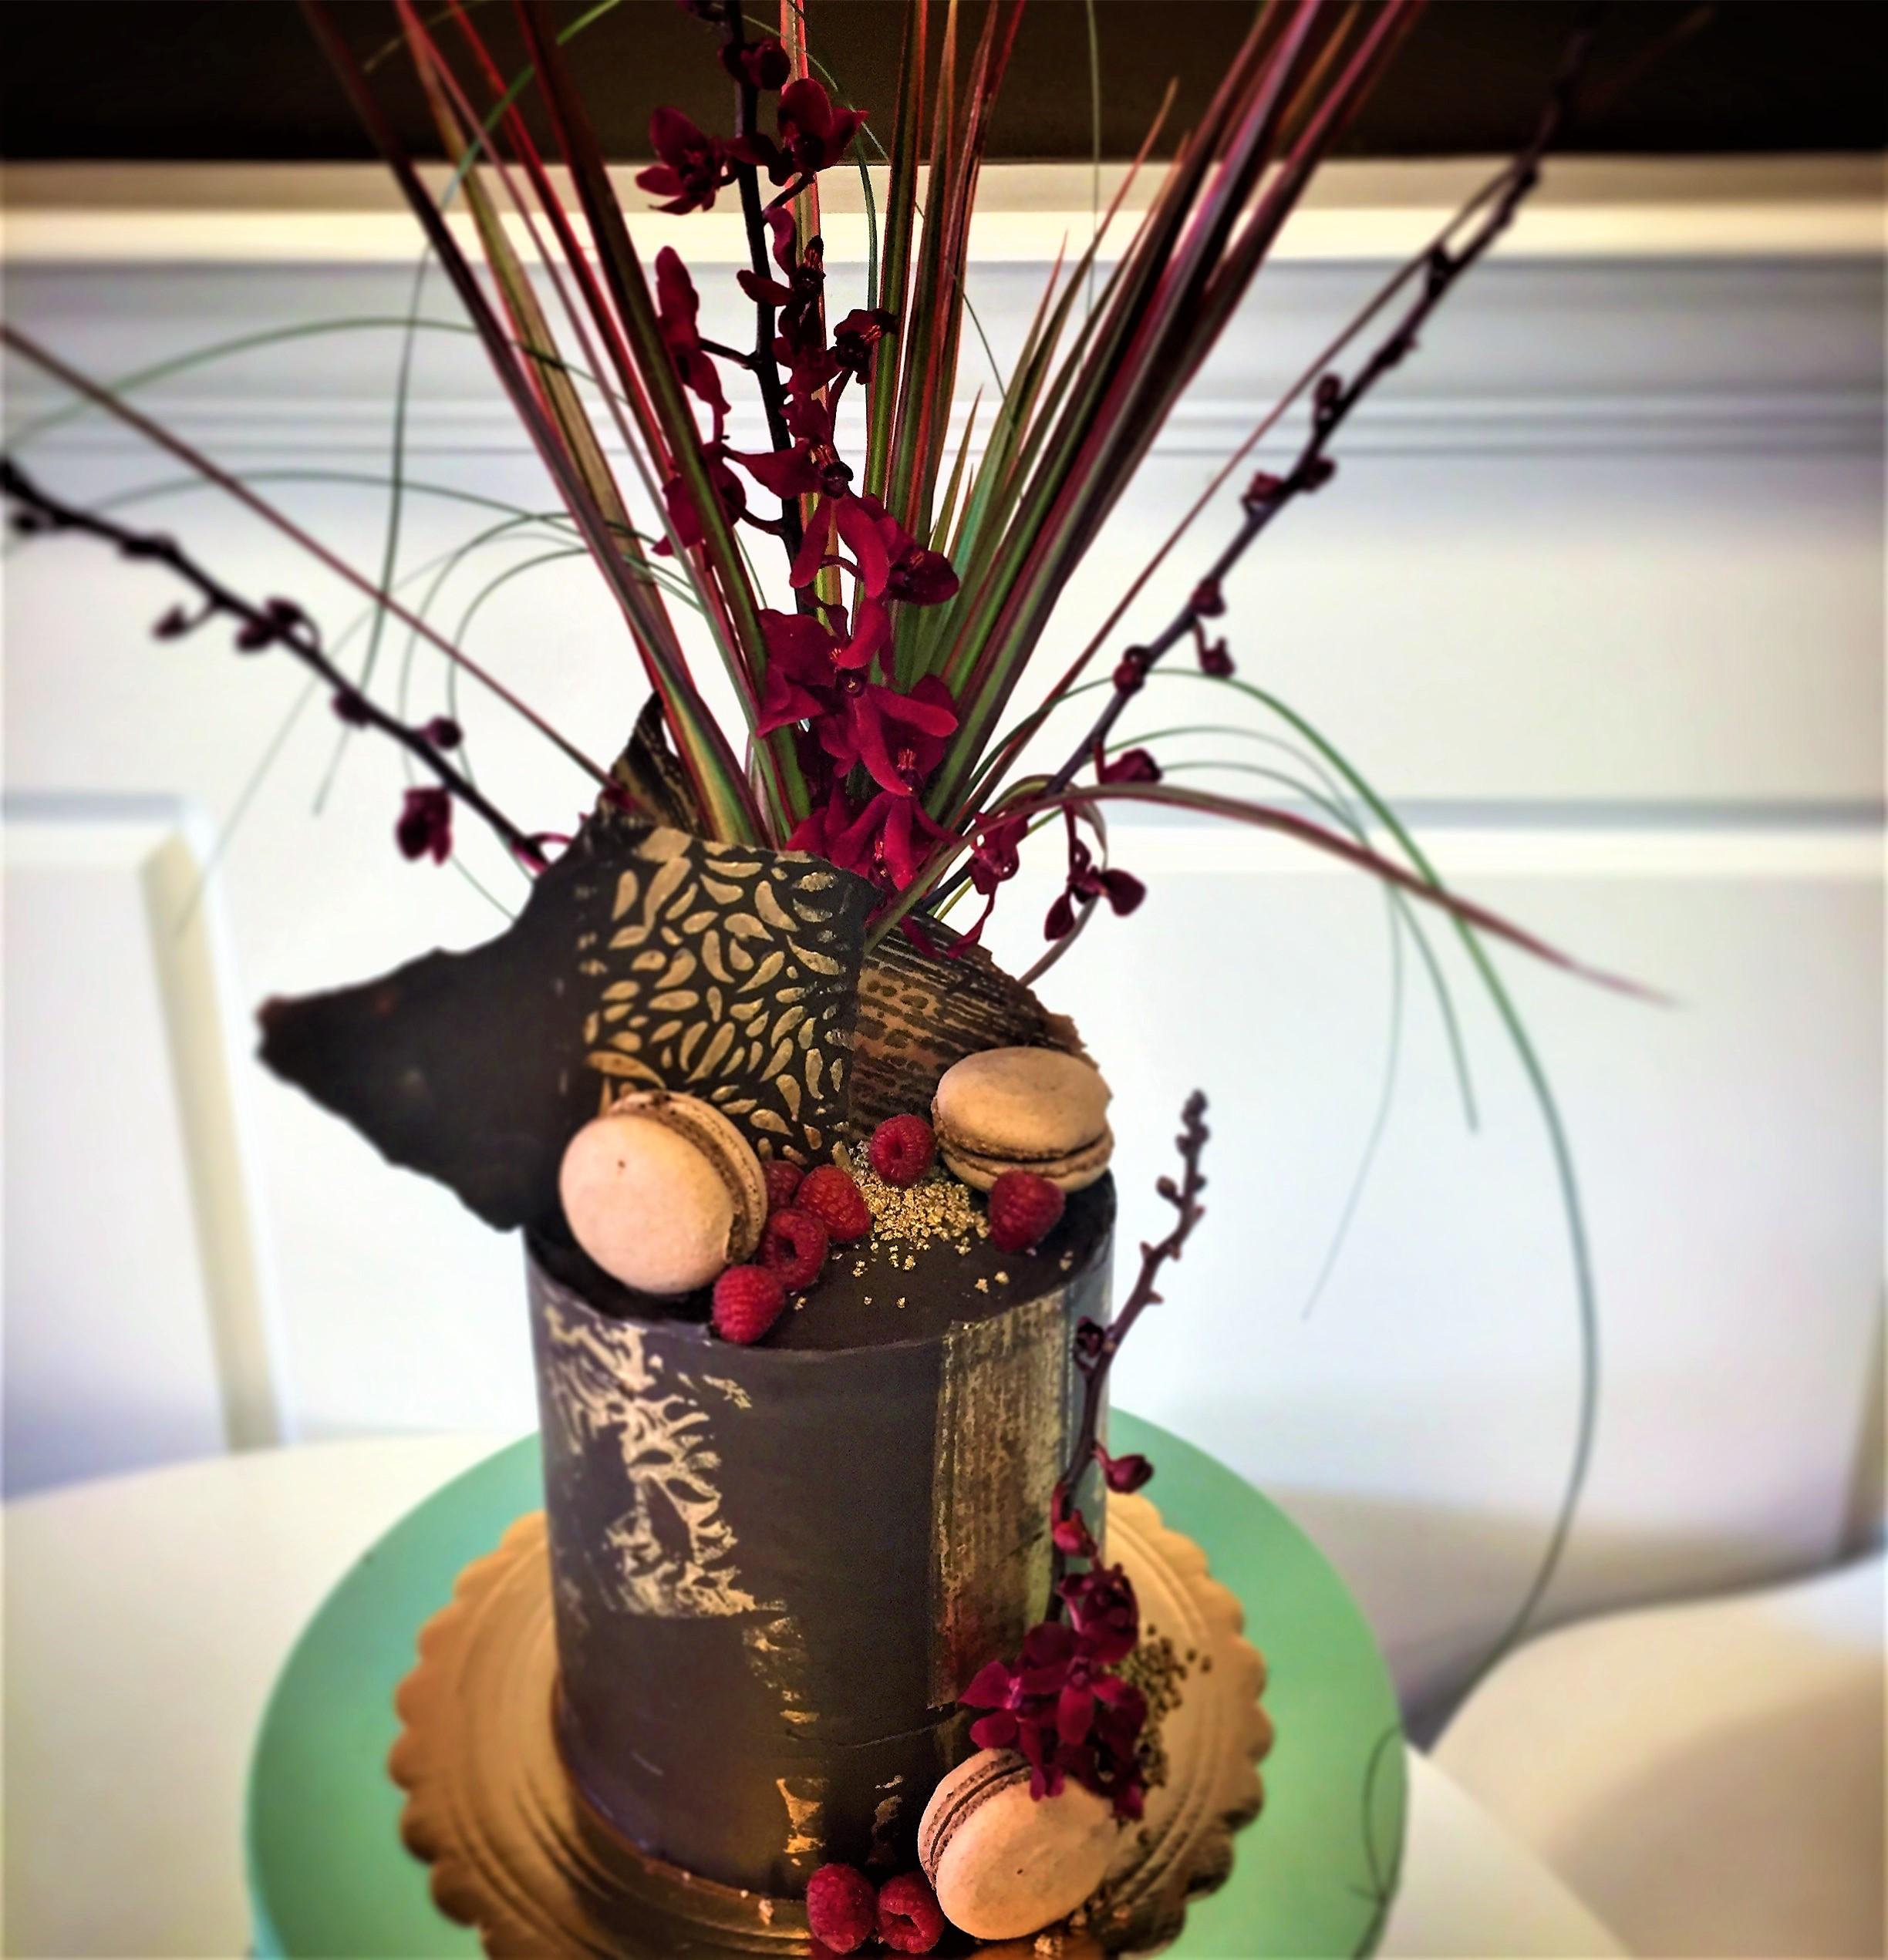 6'' chocolate coma auction cake